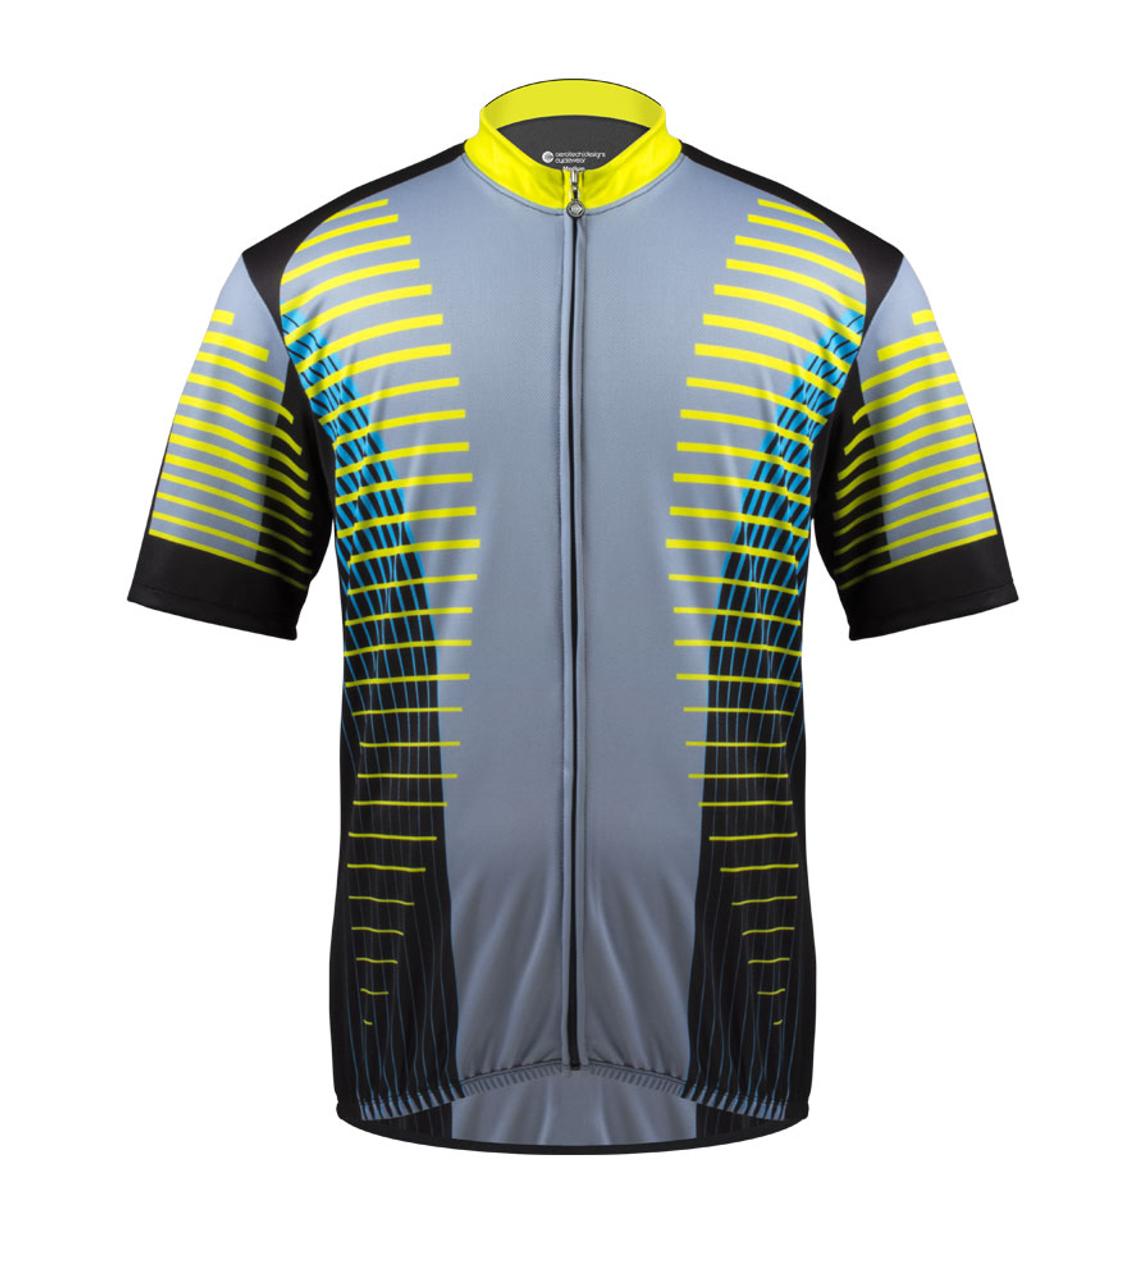 Coolmax Cycling Jersey Top Men/'s Reflective Bike Bicycle Jersey Shirts S-5XL